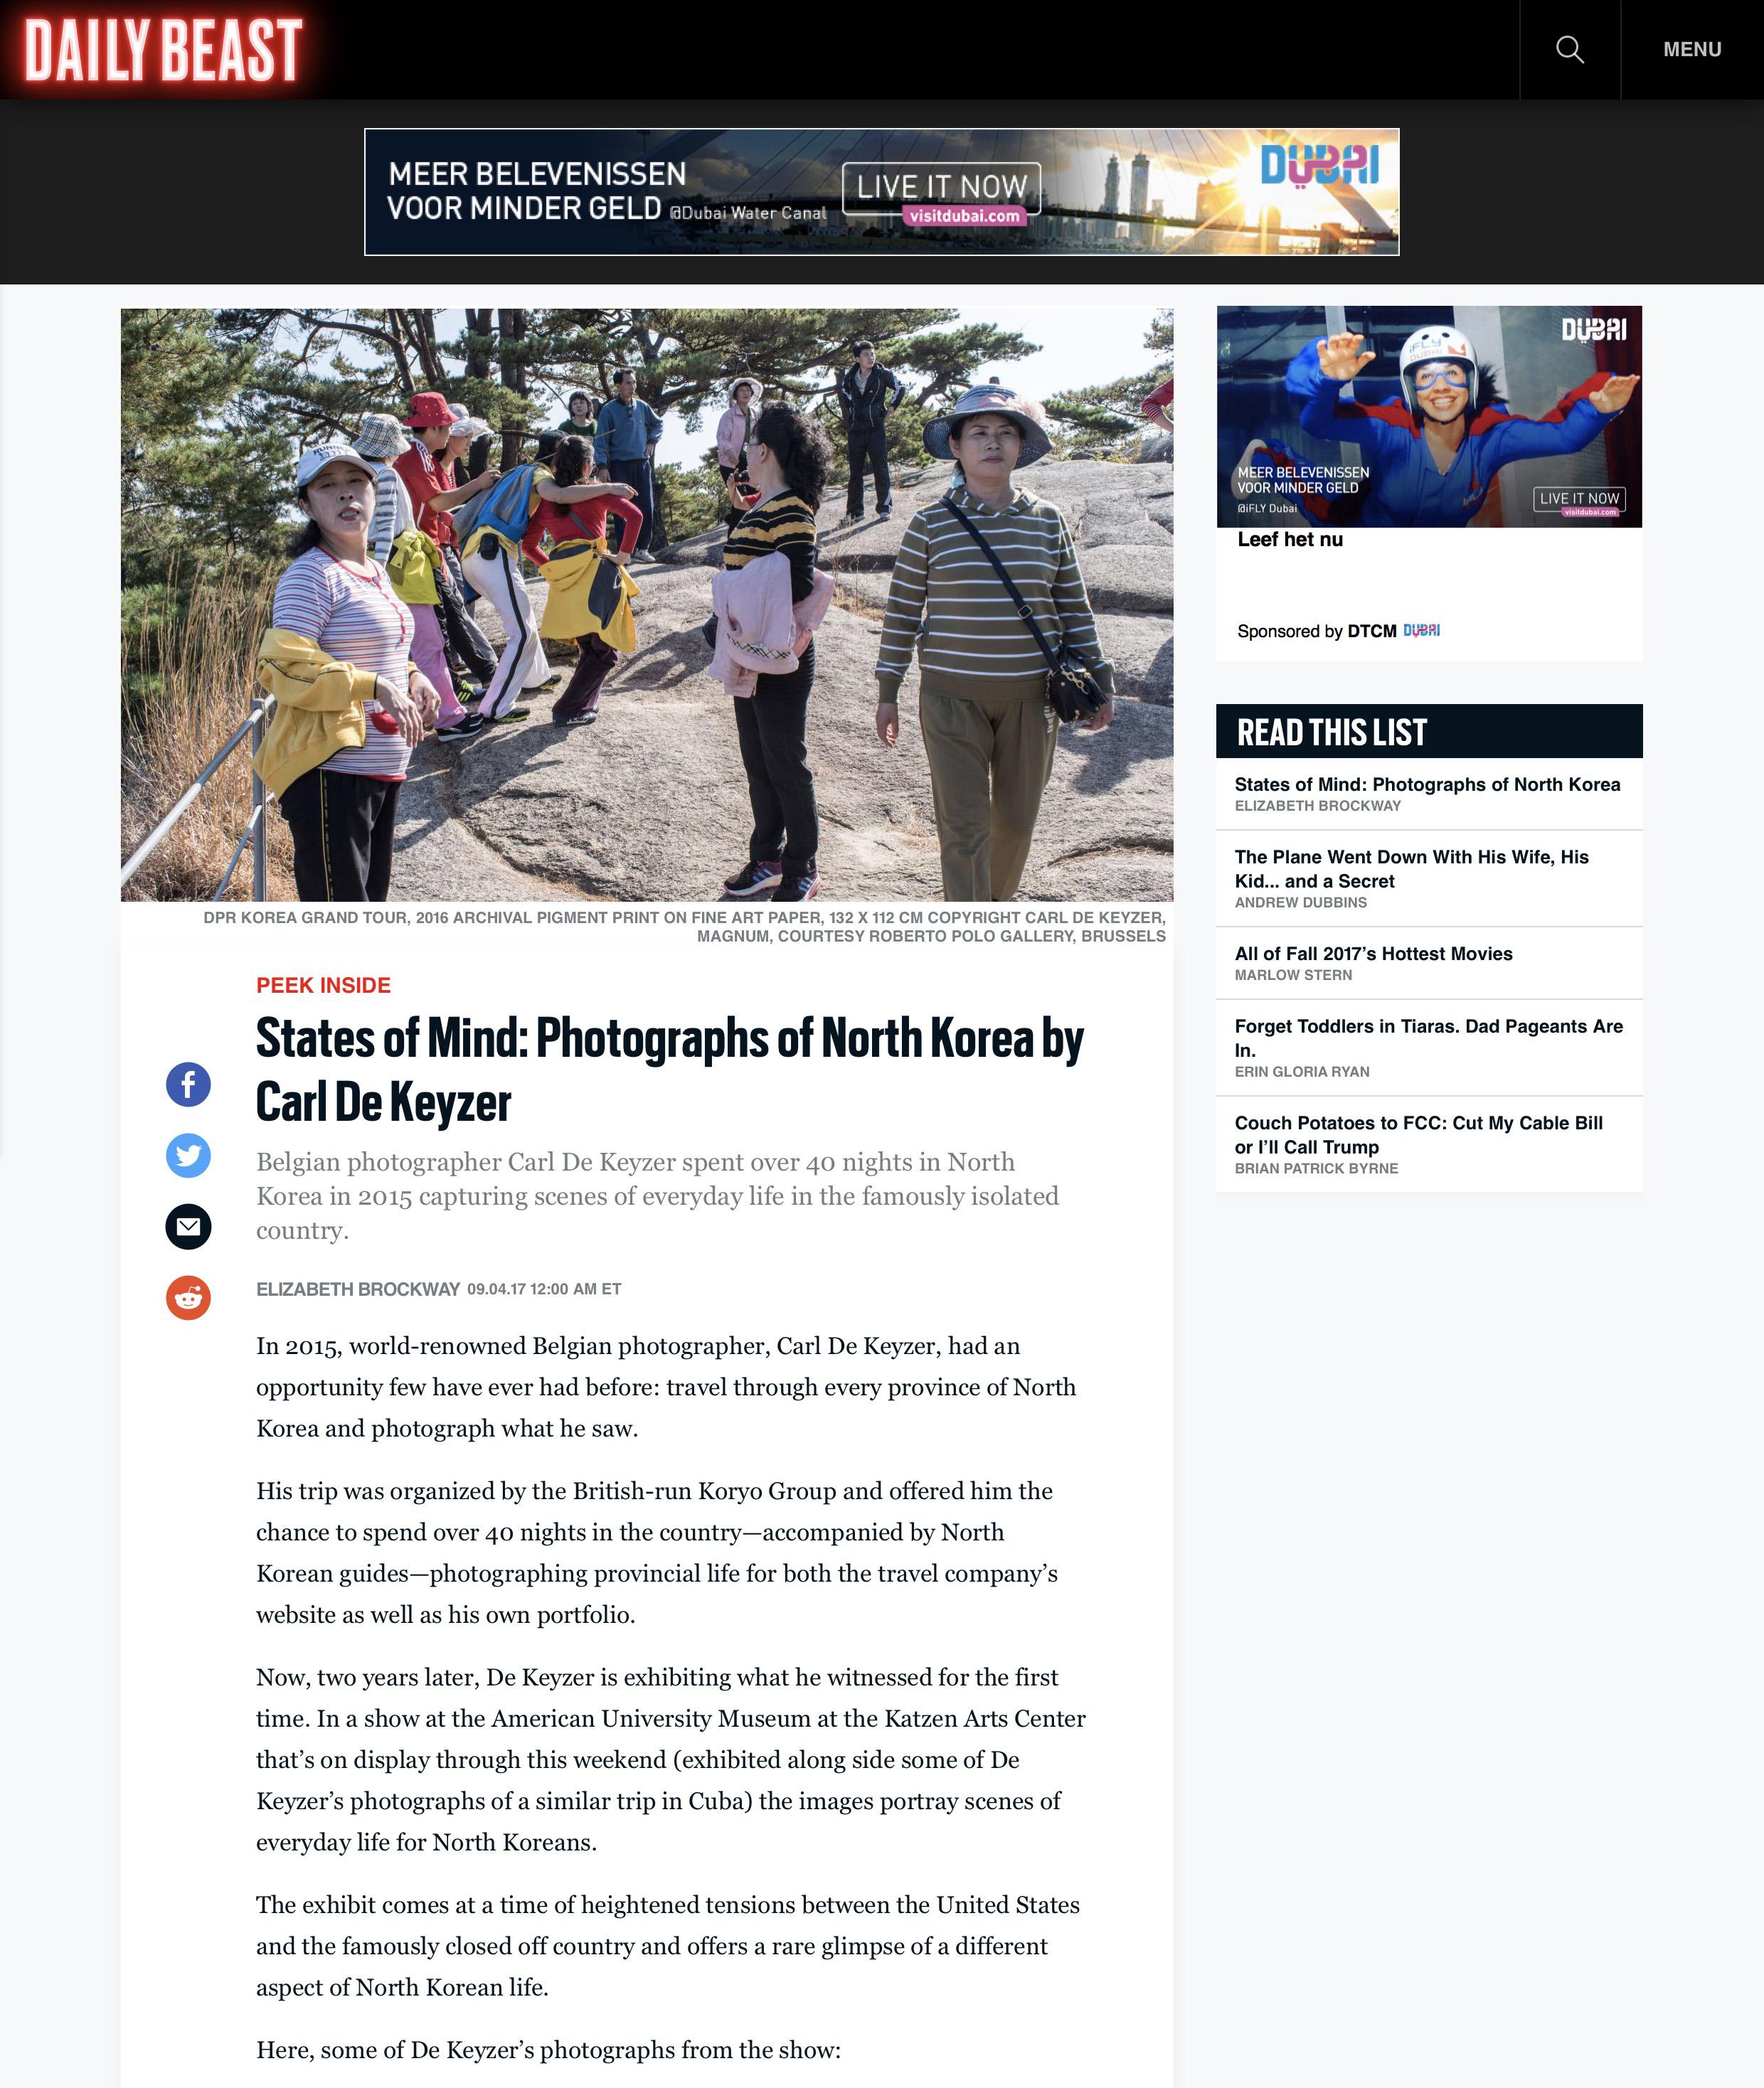 Daily Beast DPRK